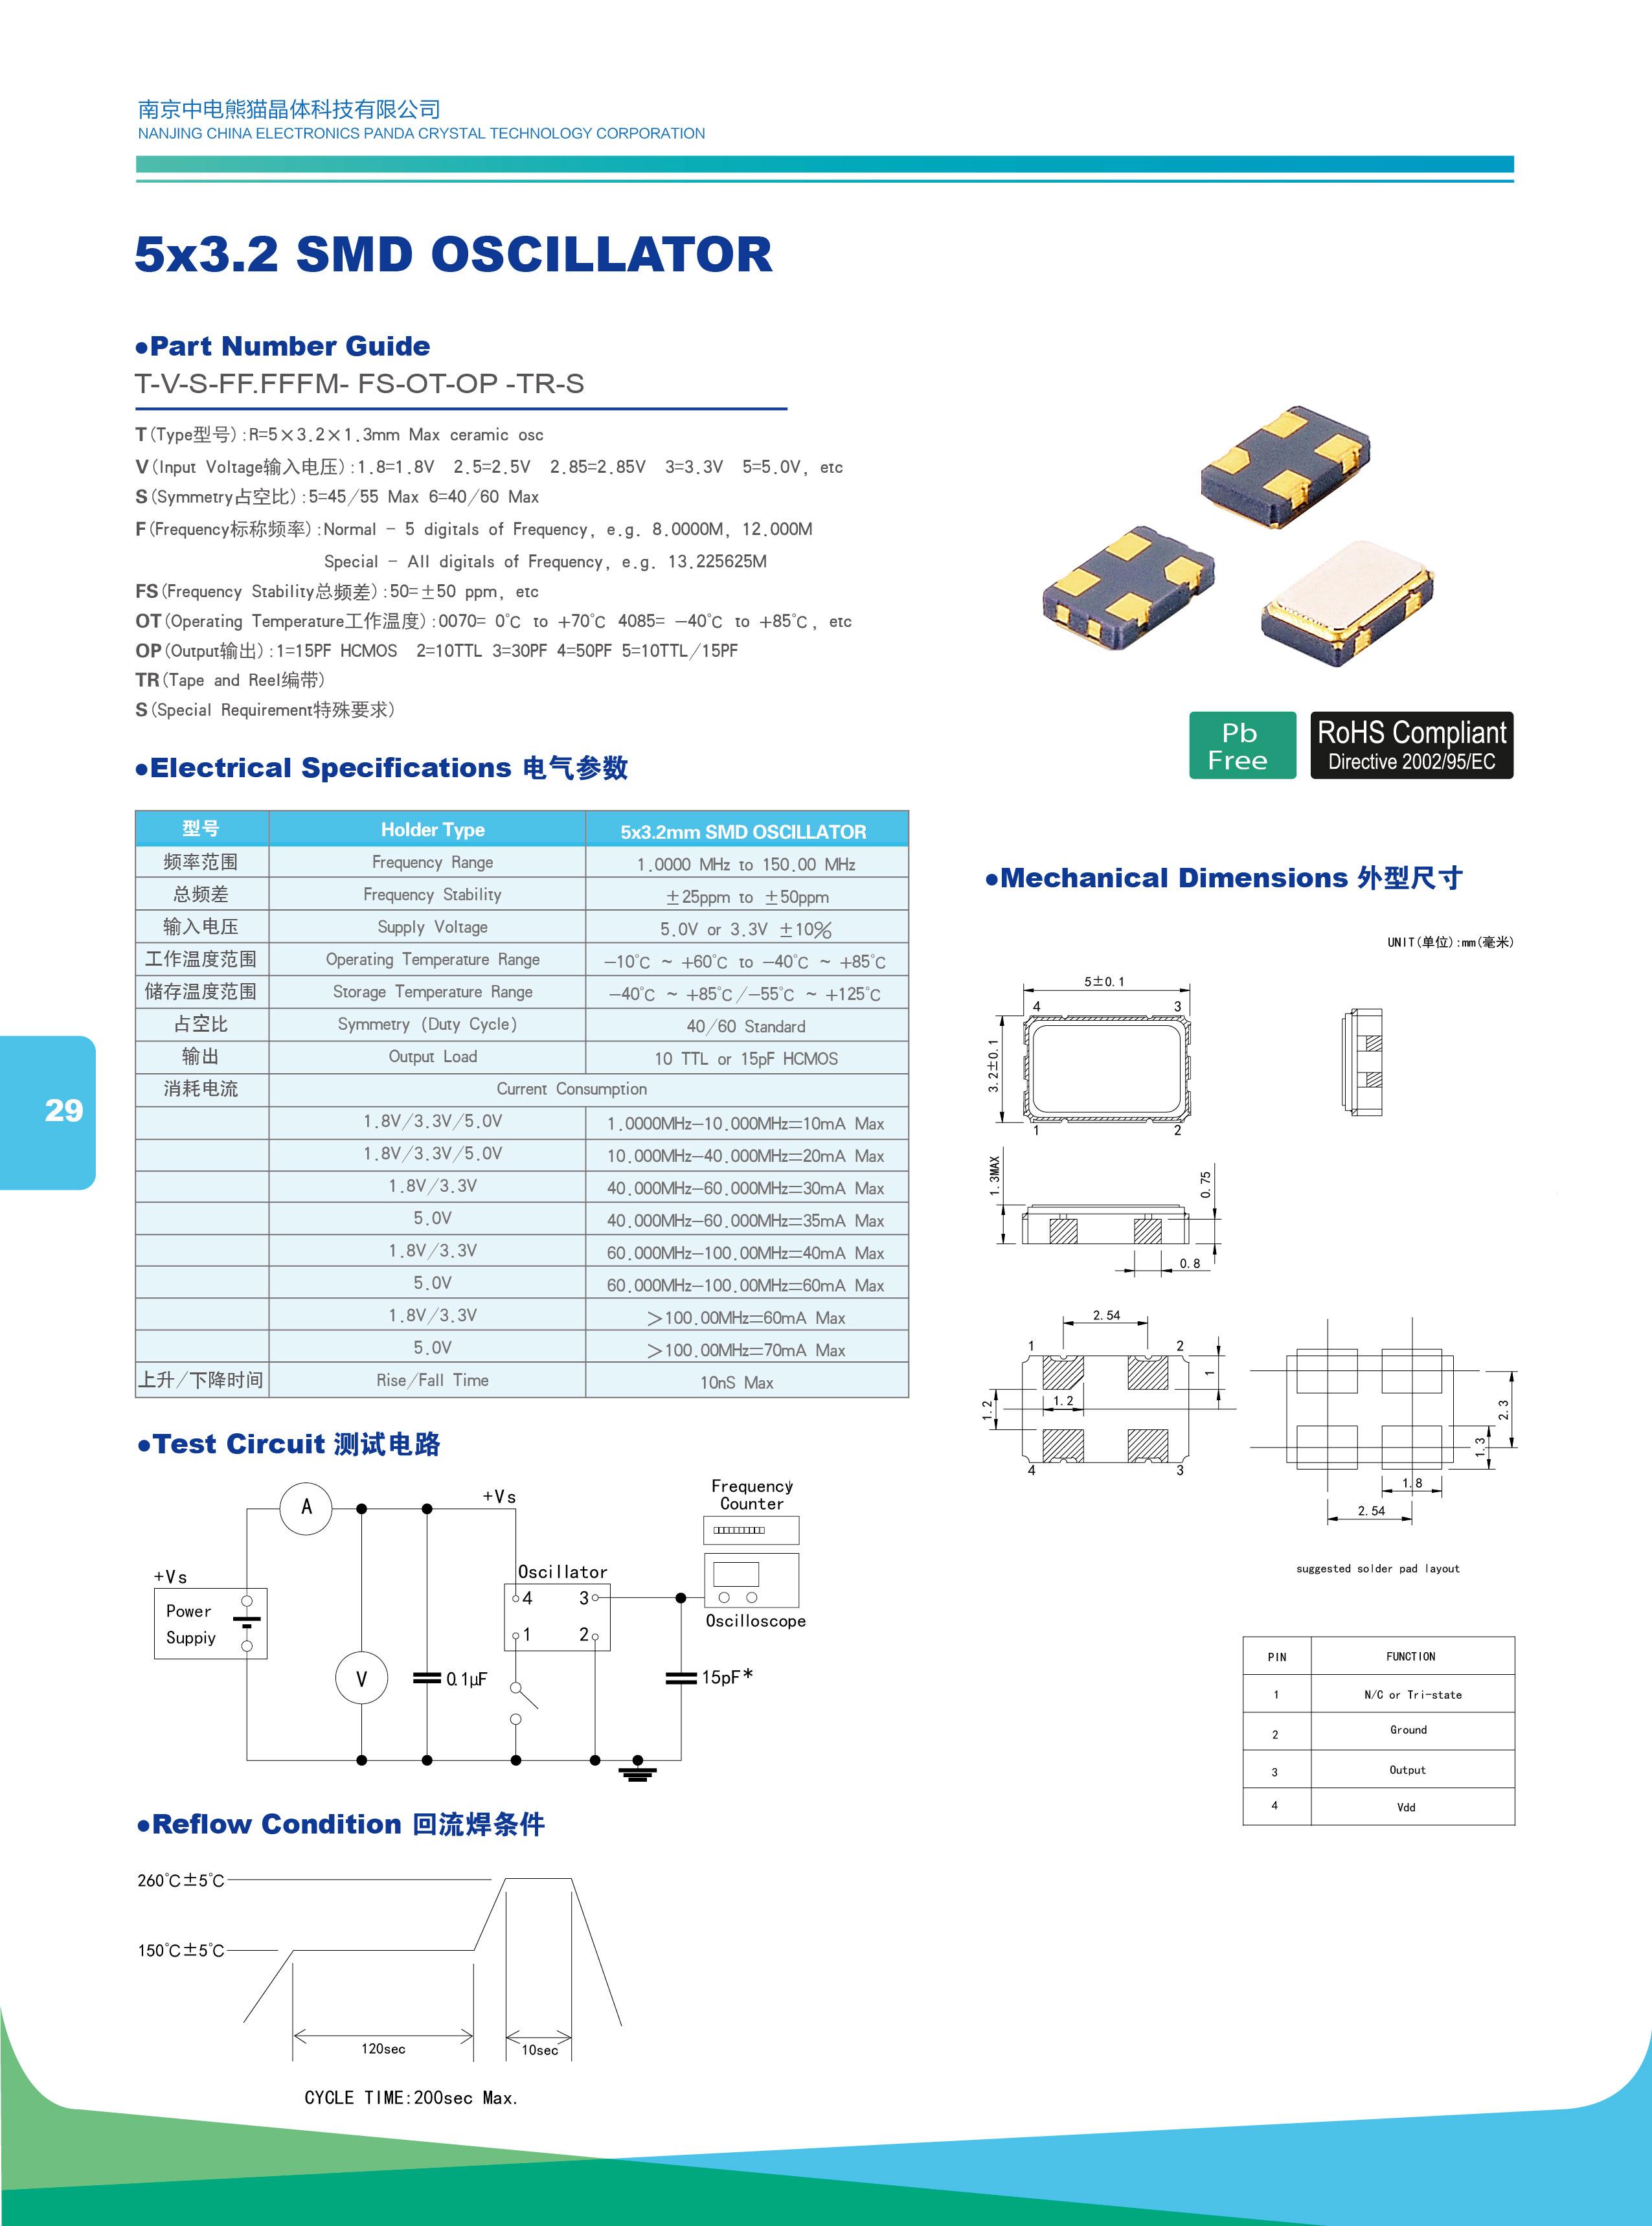 25 Items MXO45-3I-20M0000 Oscillator XO 20MHz /±50ppm 50pF HCMOS//TTL 55/% 5V 4-Pin Metal DIP Thru-Hole Tray